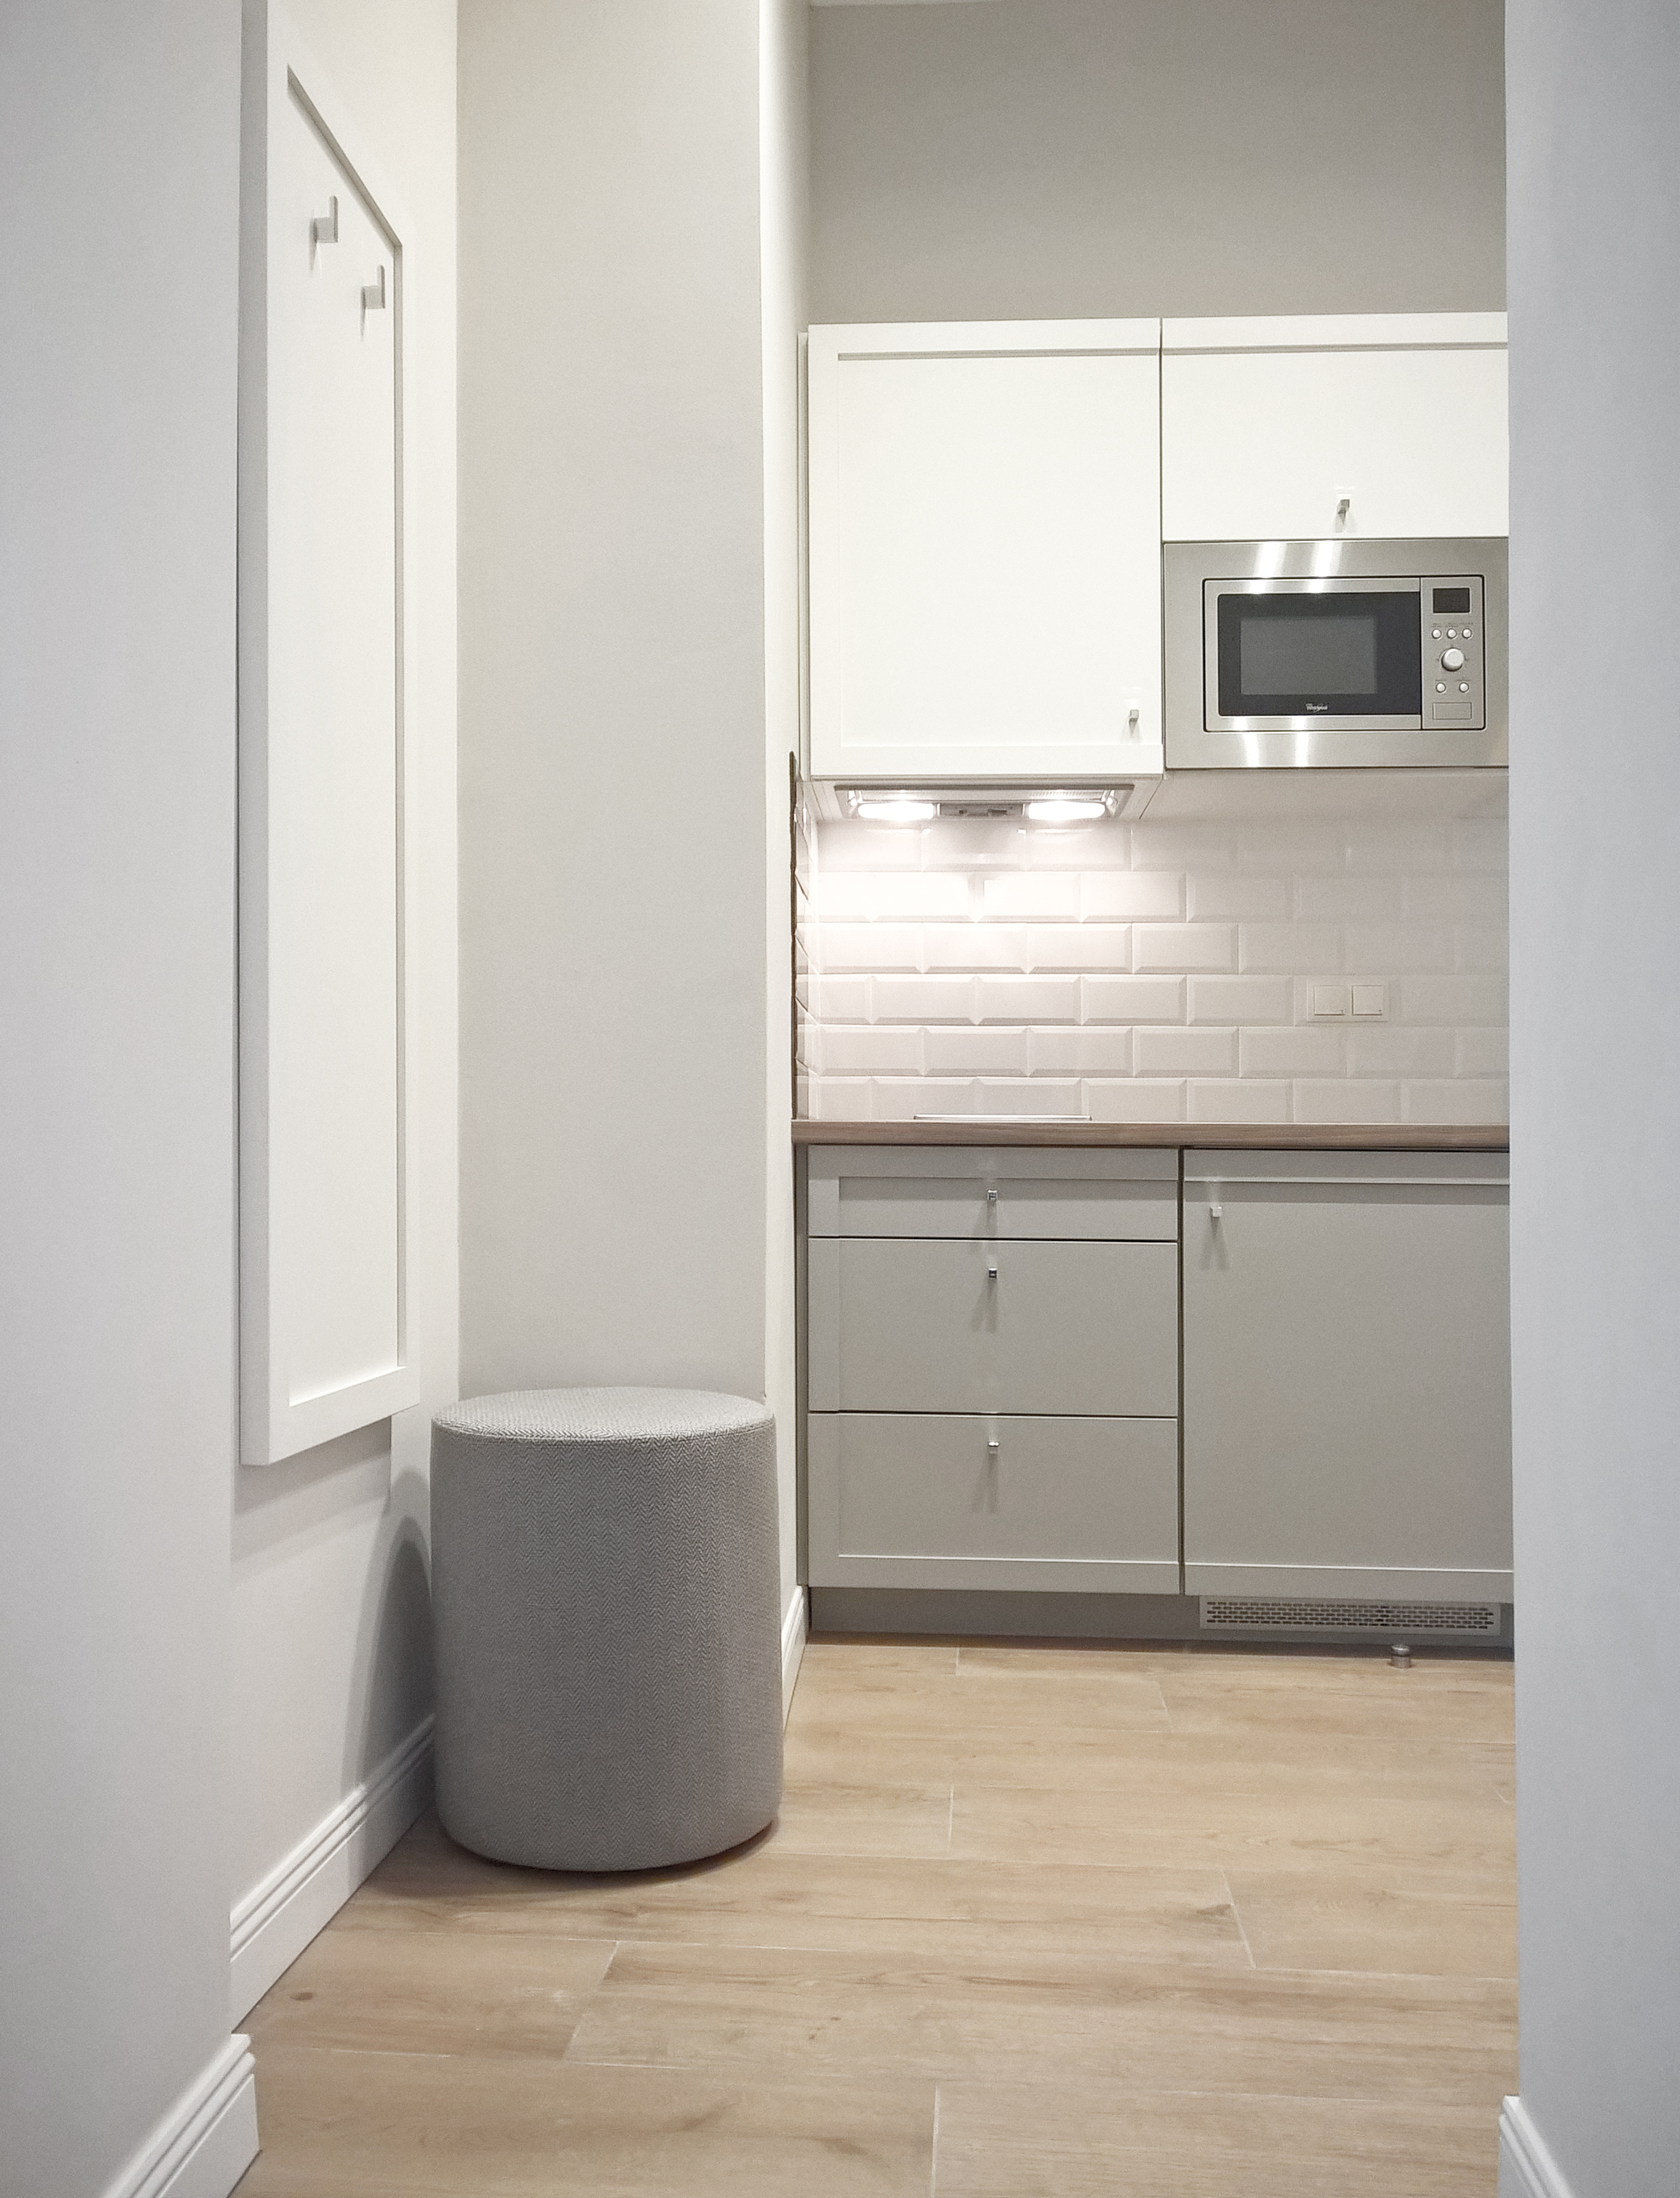 Apartament, Wrocław.